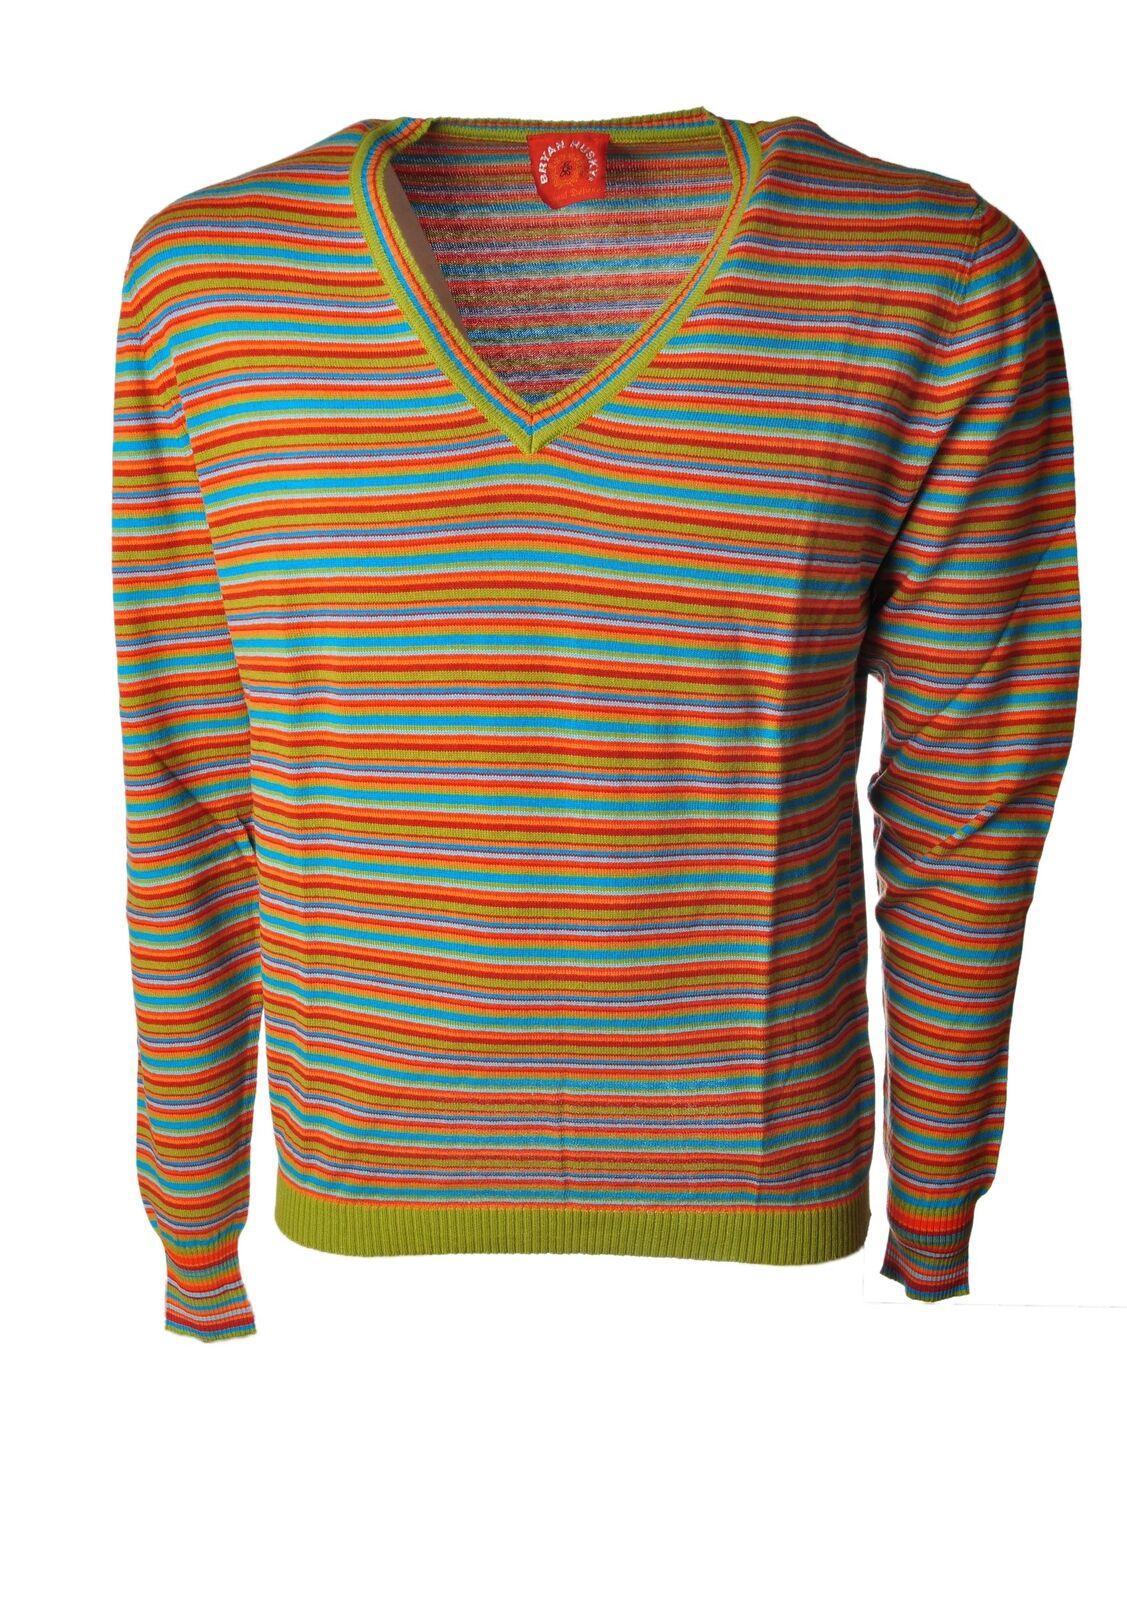 Bryan Husky  -  Sweaters - Male - Fantasy - 4512324A184949